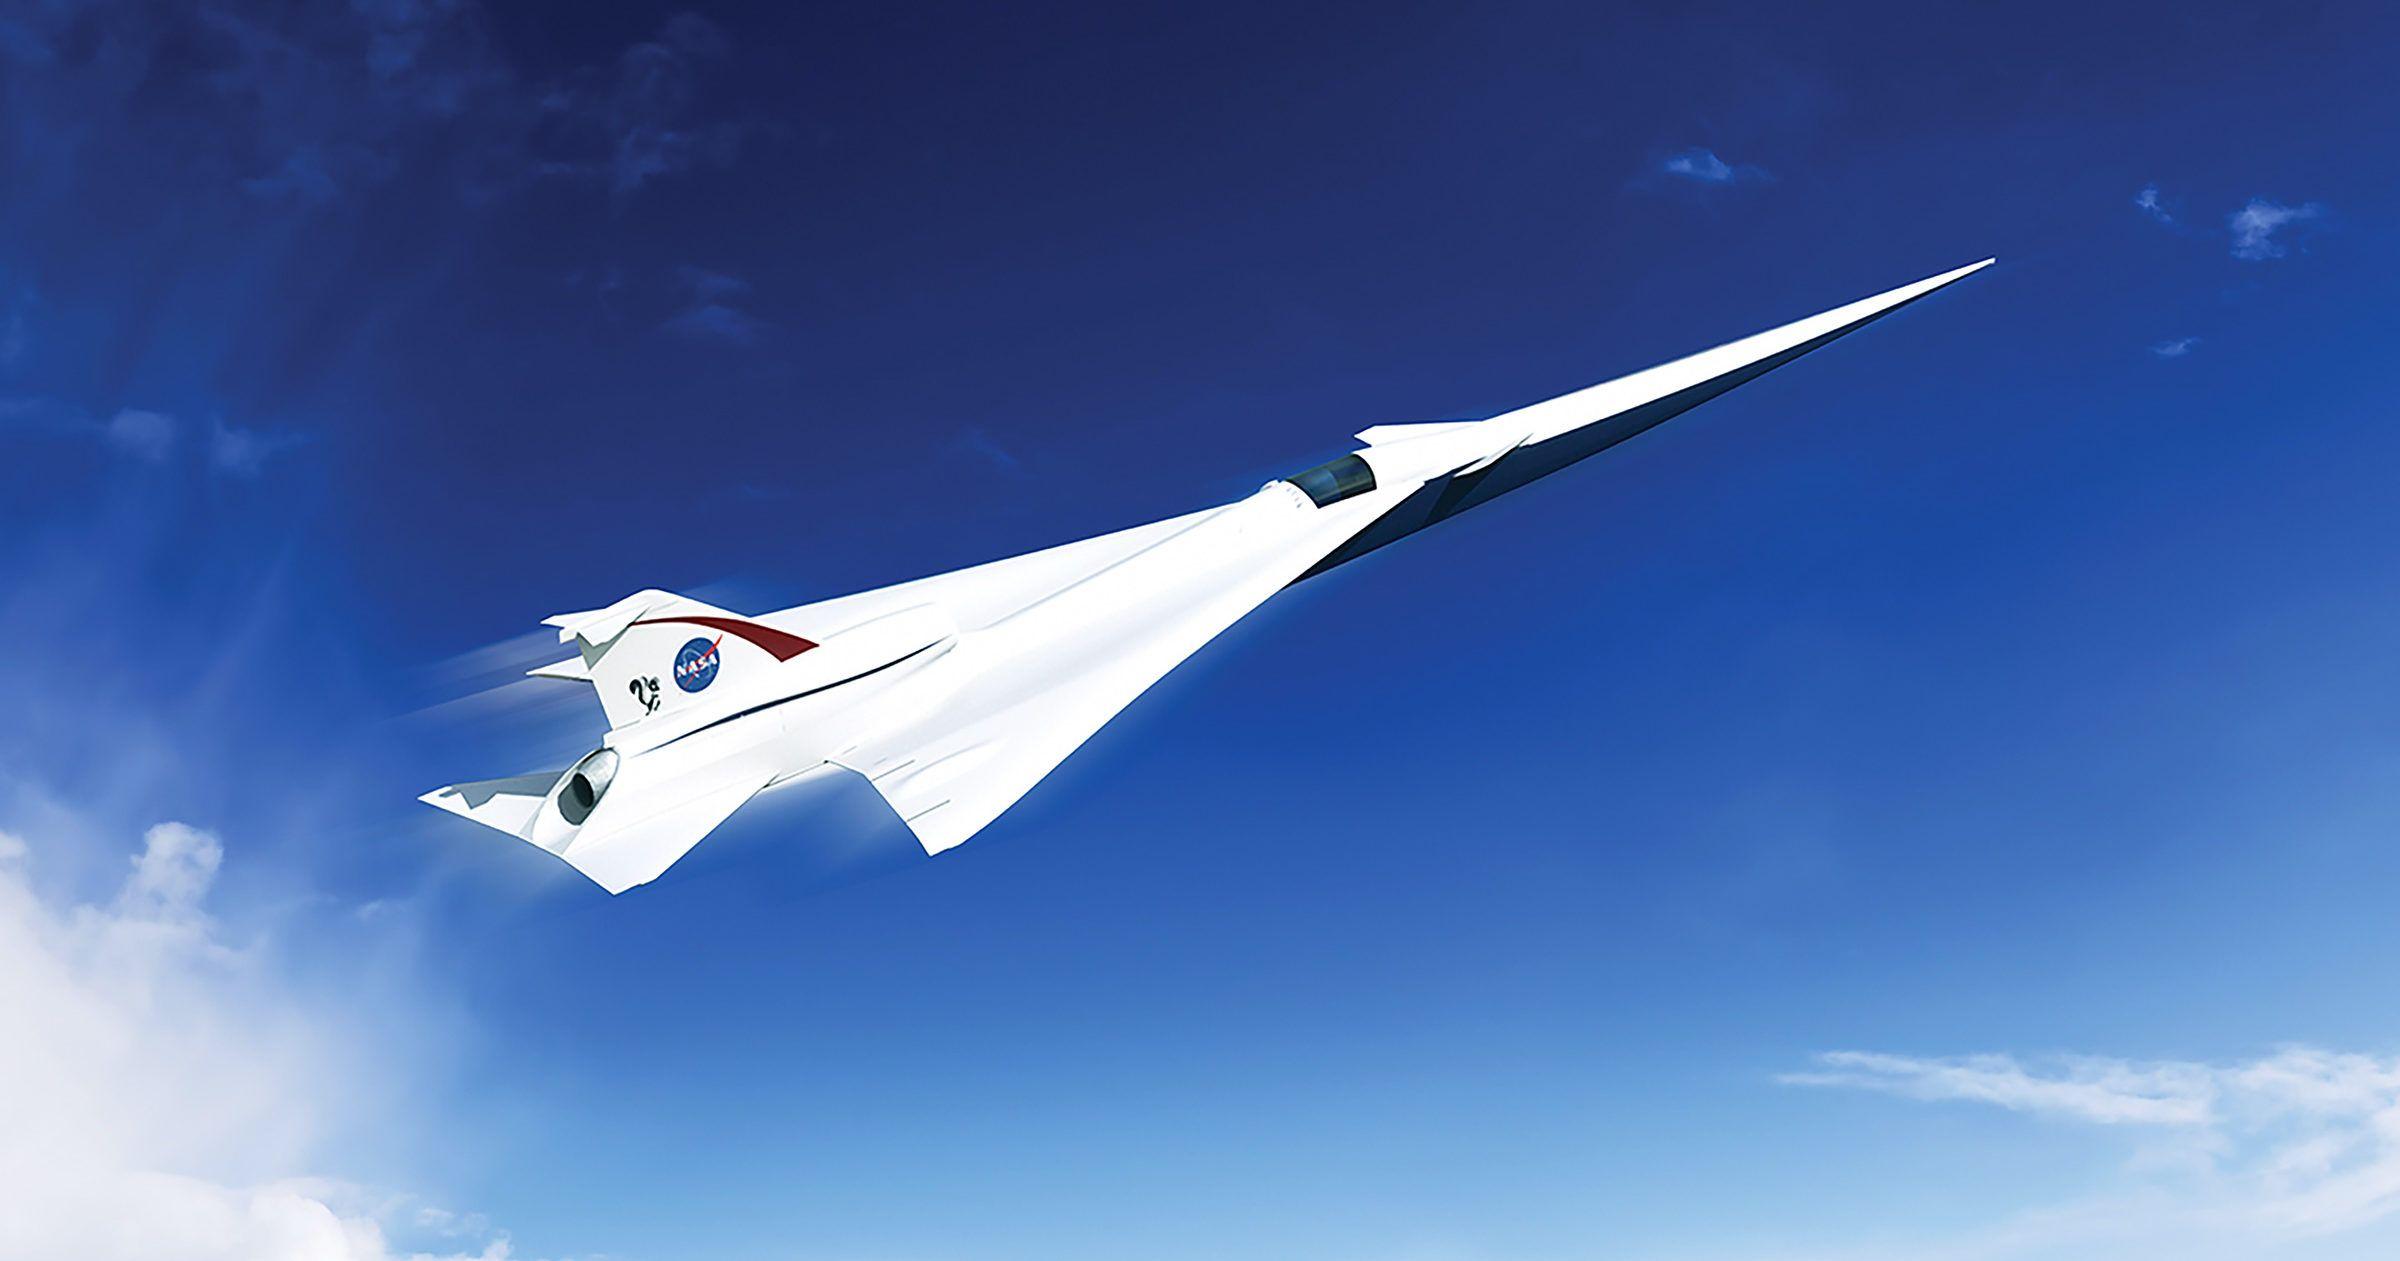 future technology planes inside. planes future technology inside